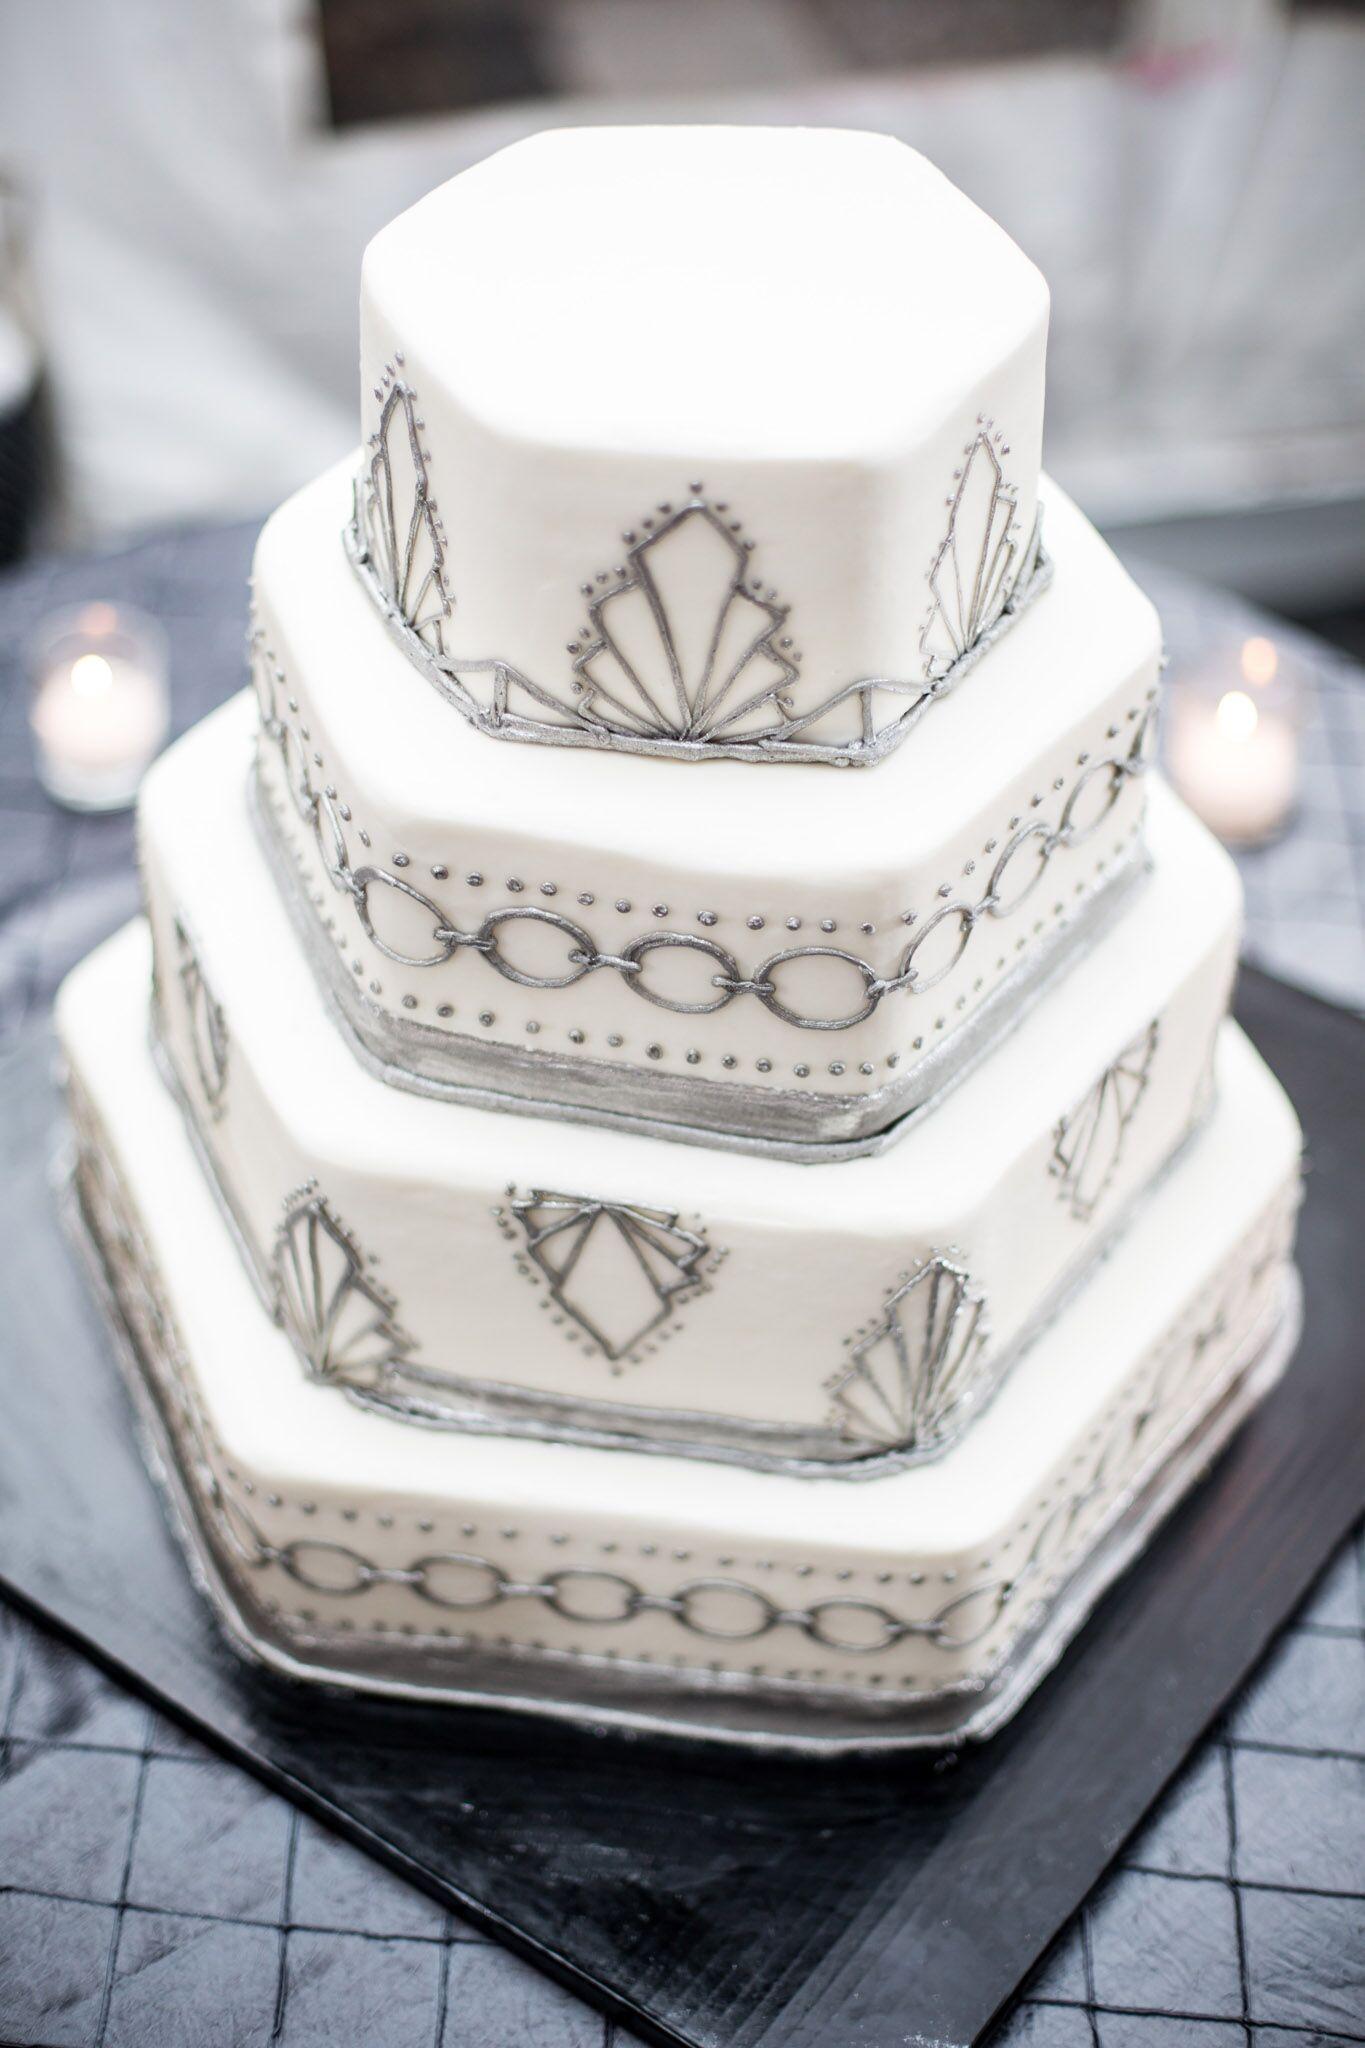 Art Deco Buttercream Wedding Cake : Silver, Hexagonal, Art Deco Wedding Cake